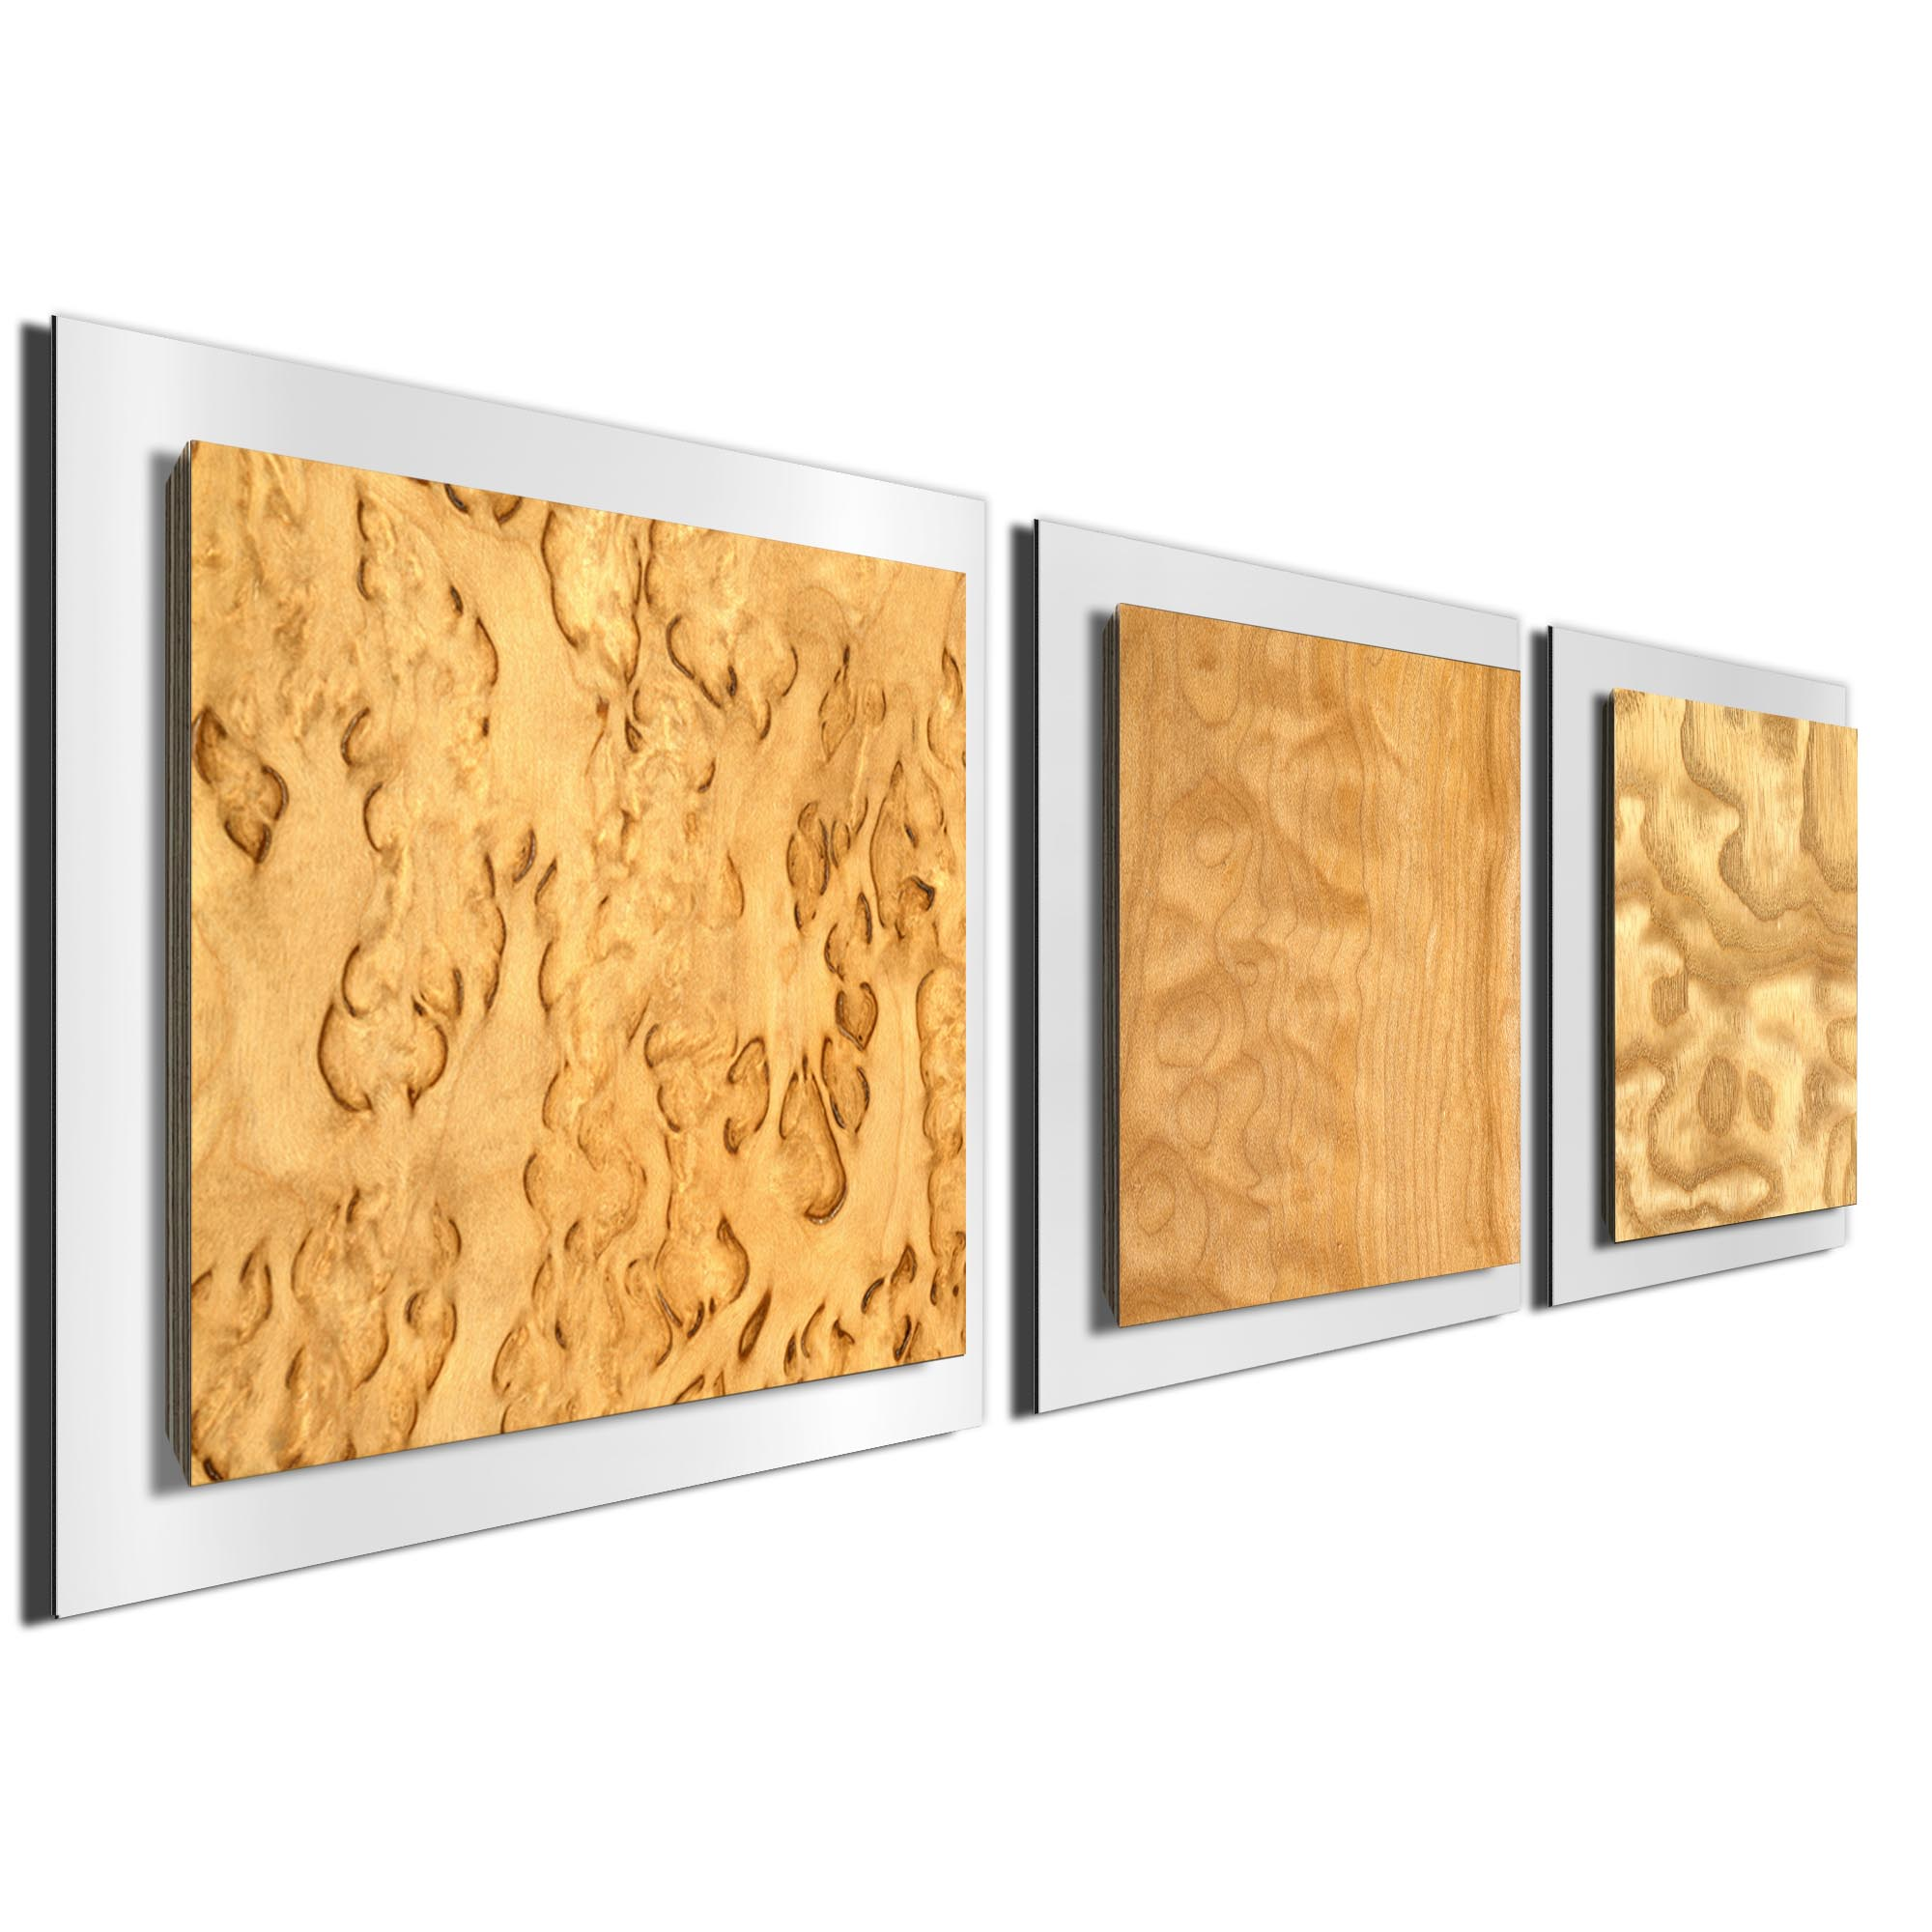 Light Burl Essence White by Jackson Wright Rustic Modern Style Wood Wall Art - Image 2